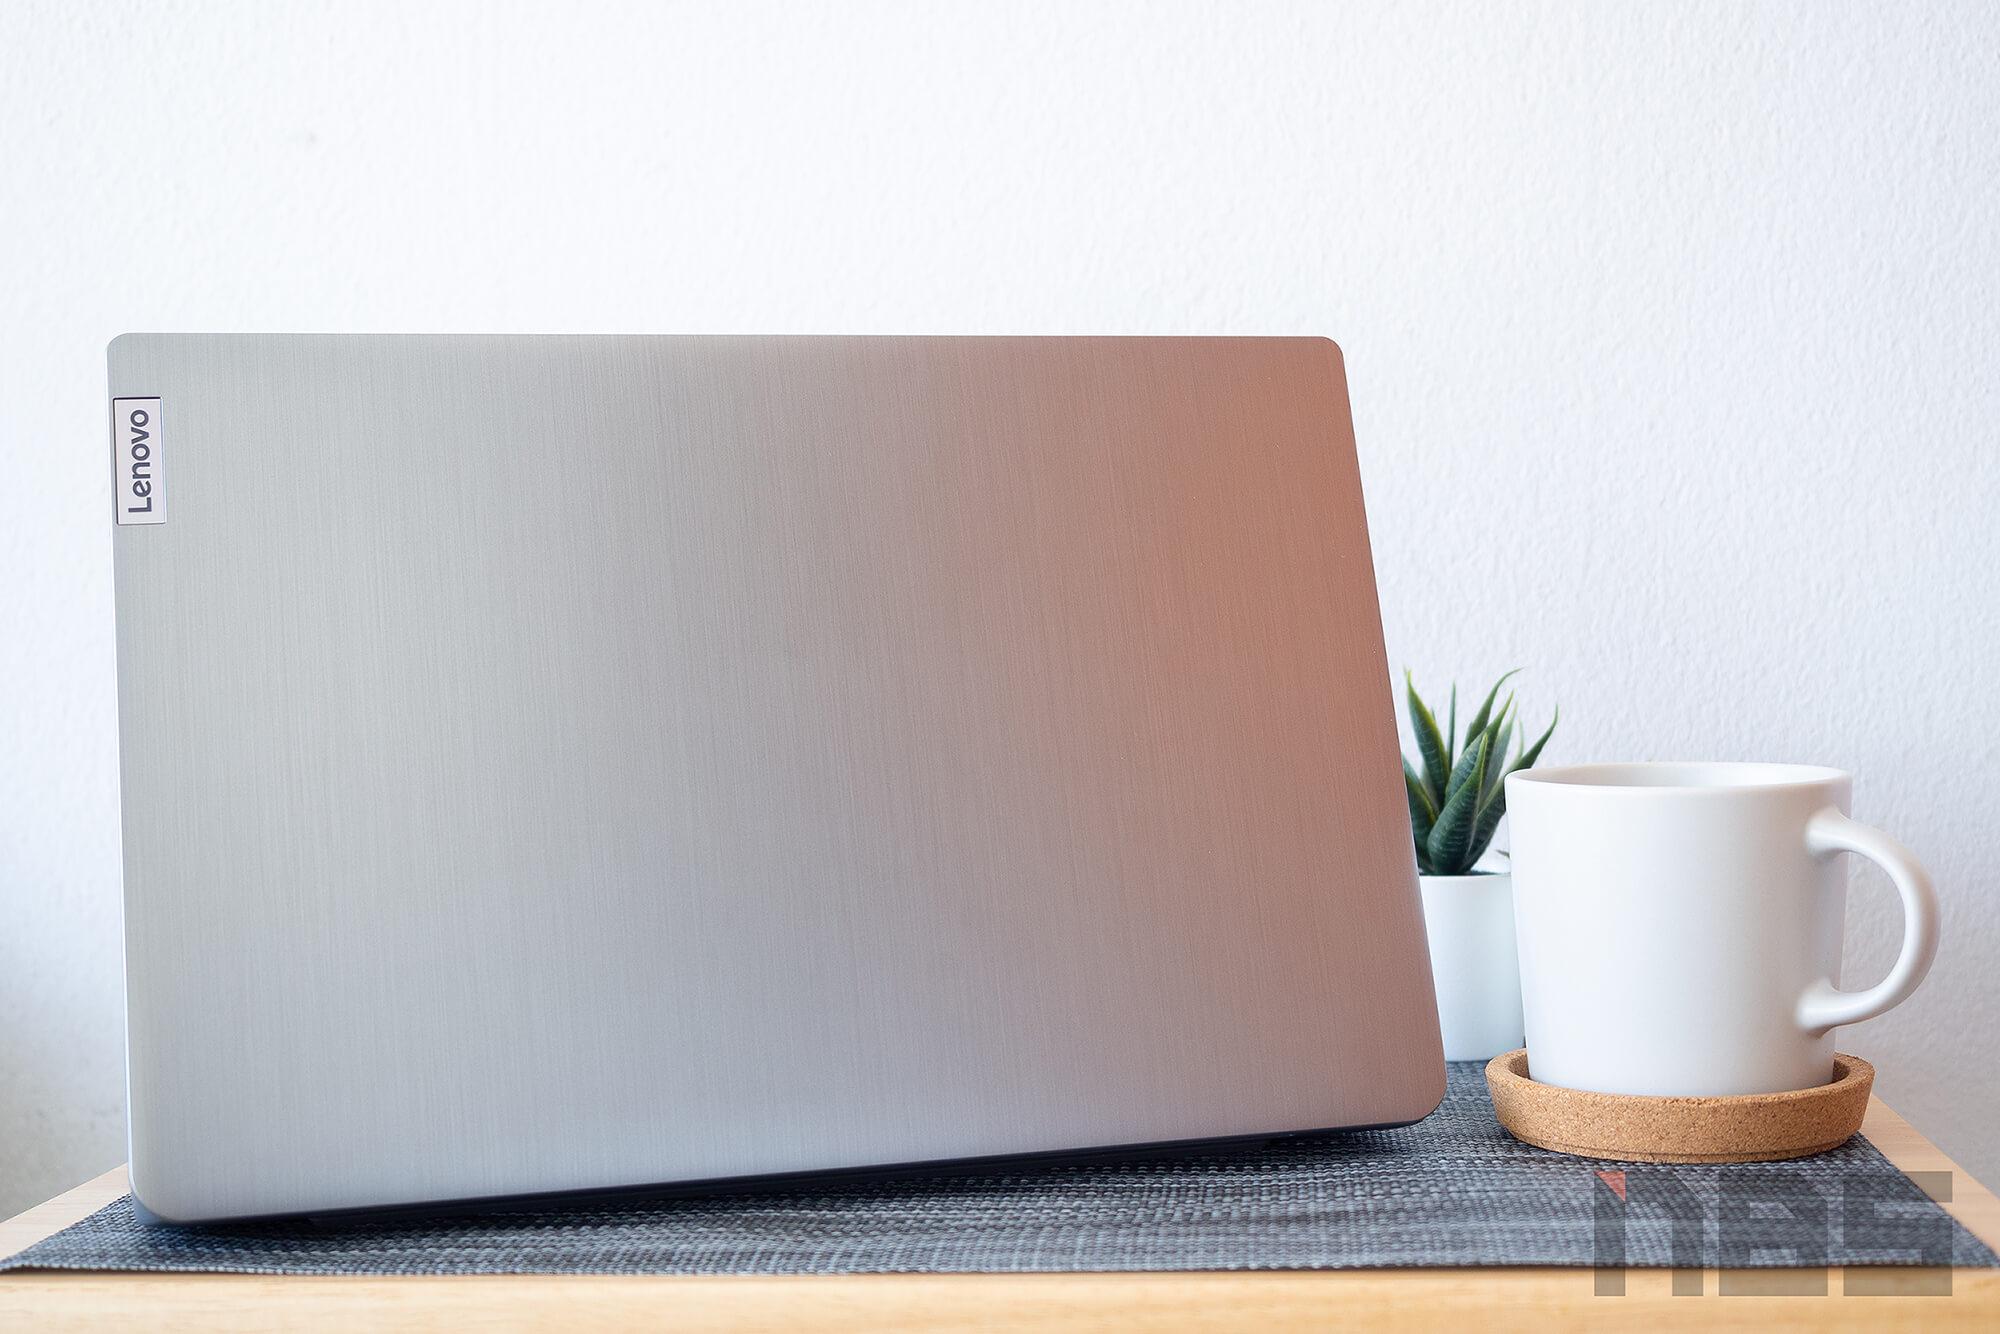 Review Lenovo IdeaPad Slim 3i pentium NotebookSPEC 16